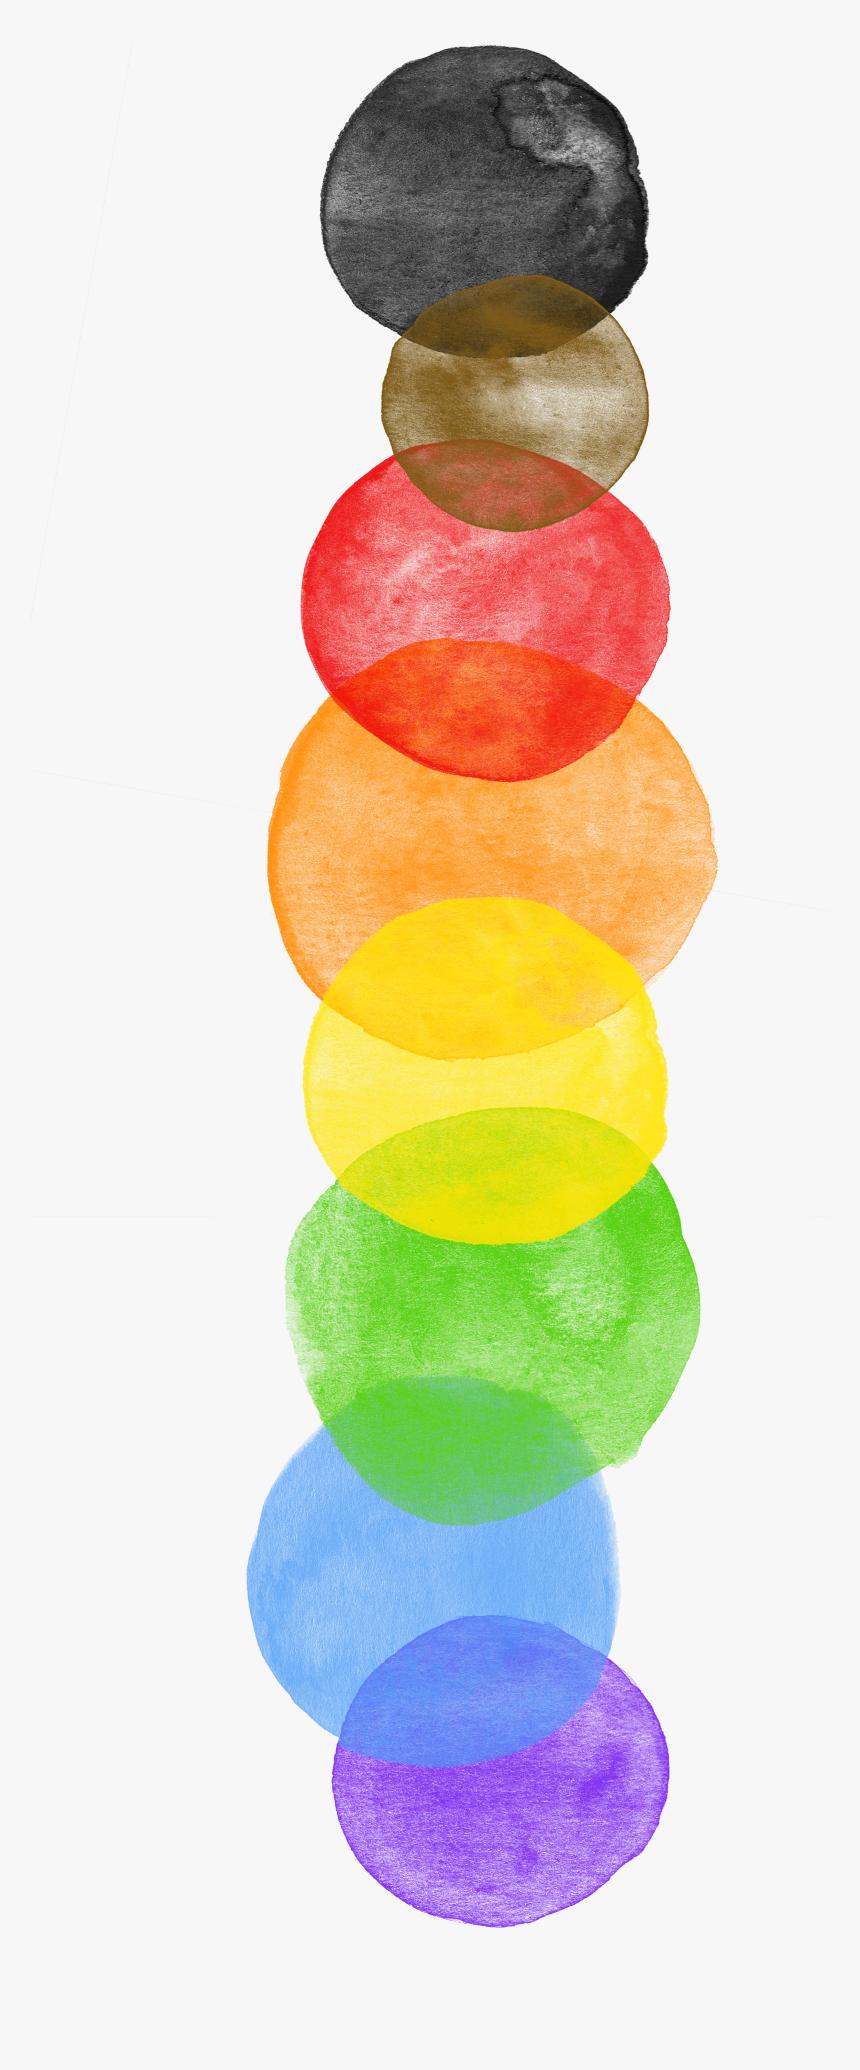 #rainbow #flag #rainbow #rainbowpride #socialjustice - Craft, HD Png Download, Free Download